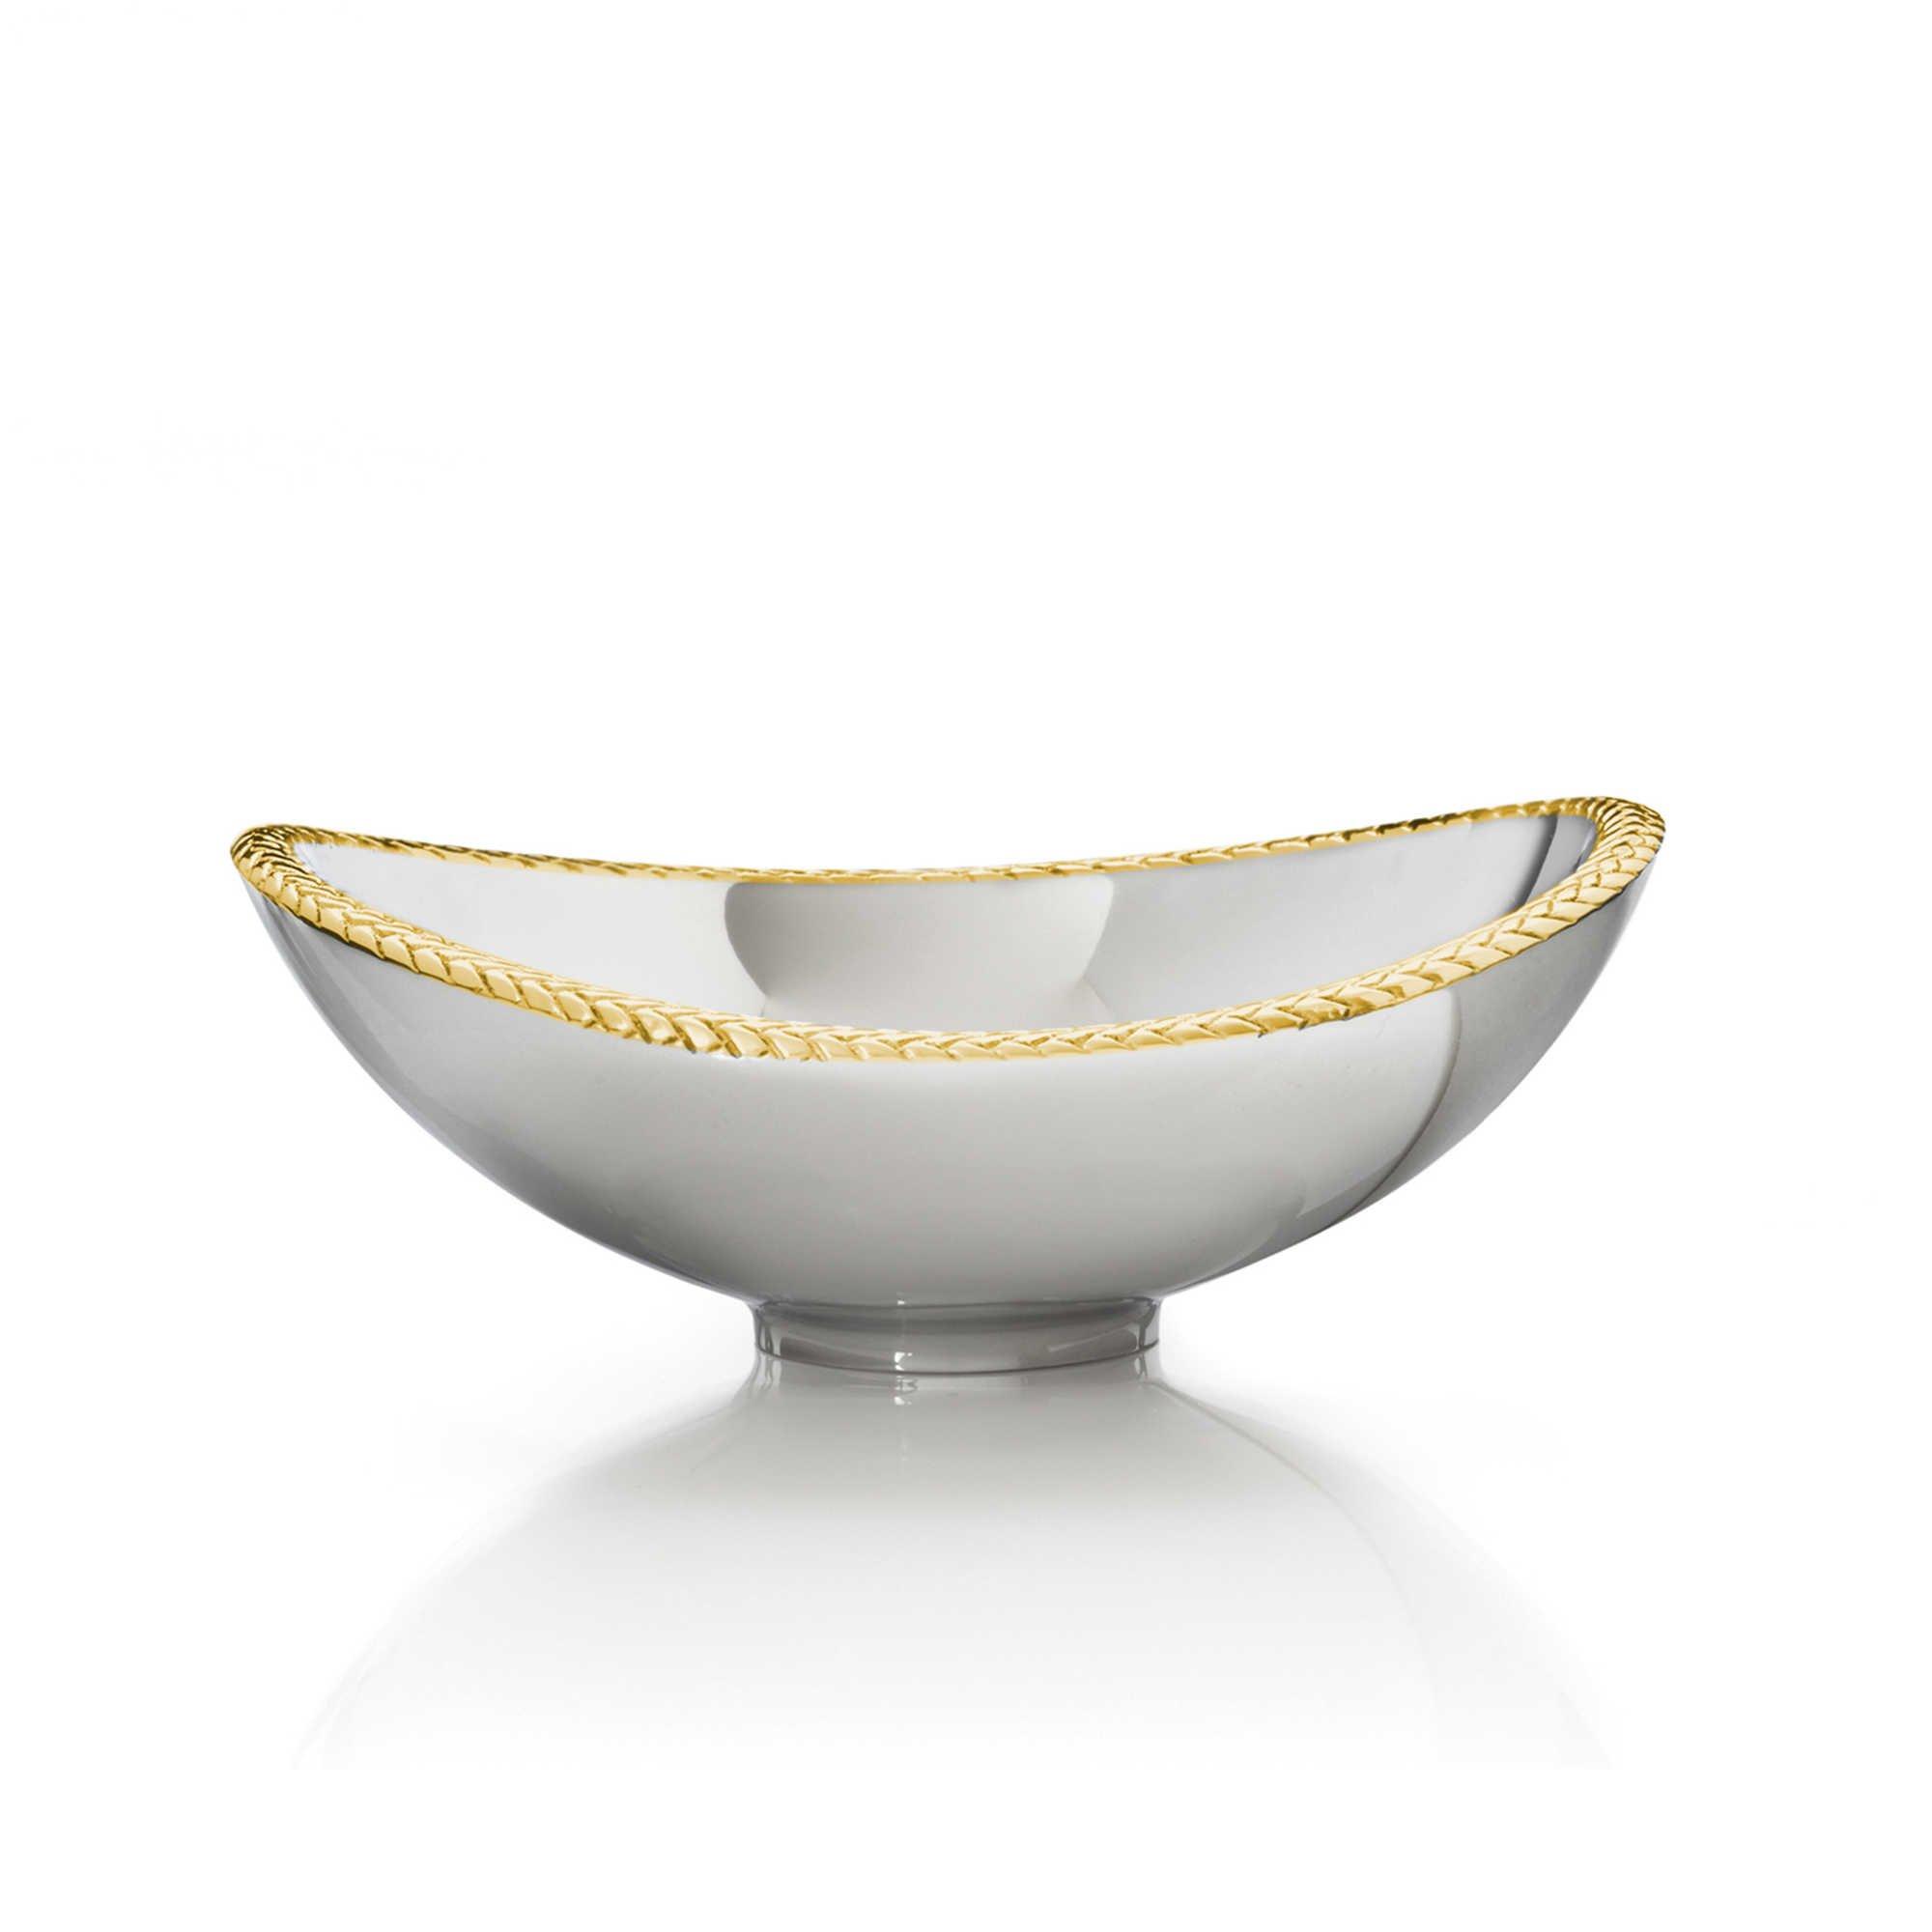 Nambe Braid 6 Inch Gold Nut Bowl